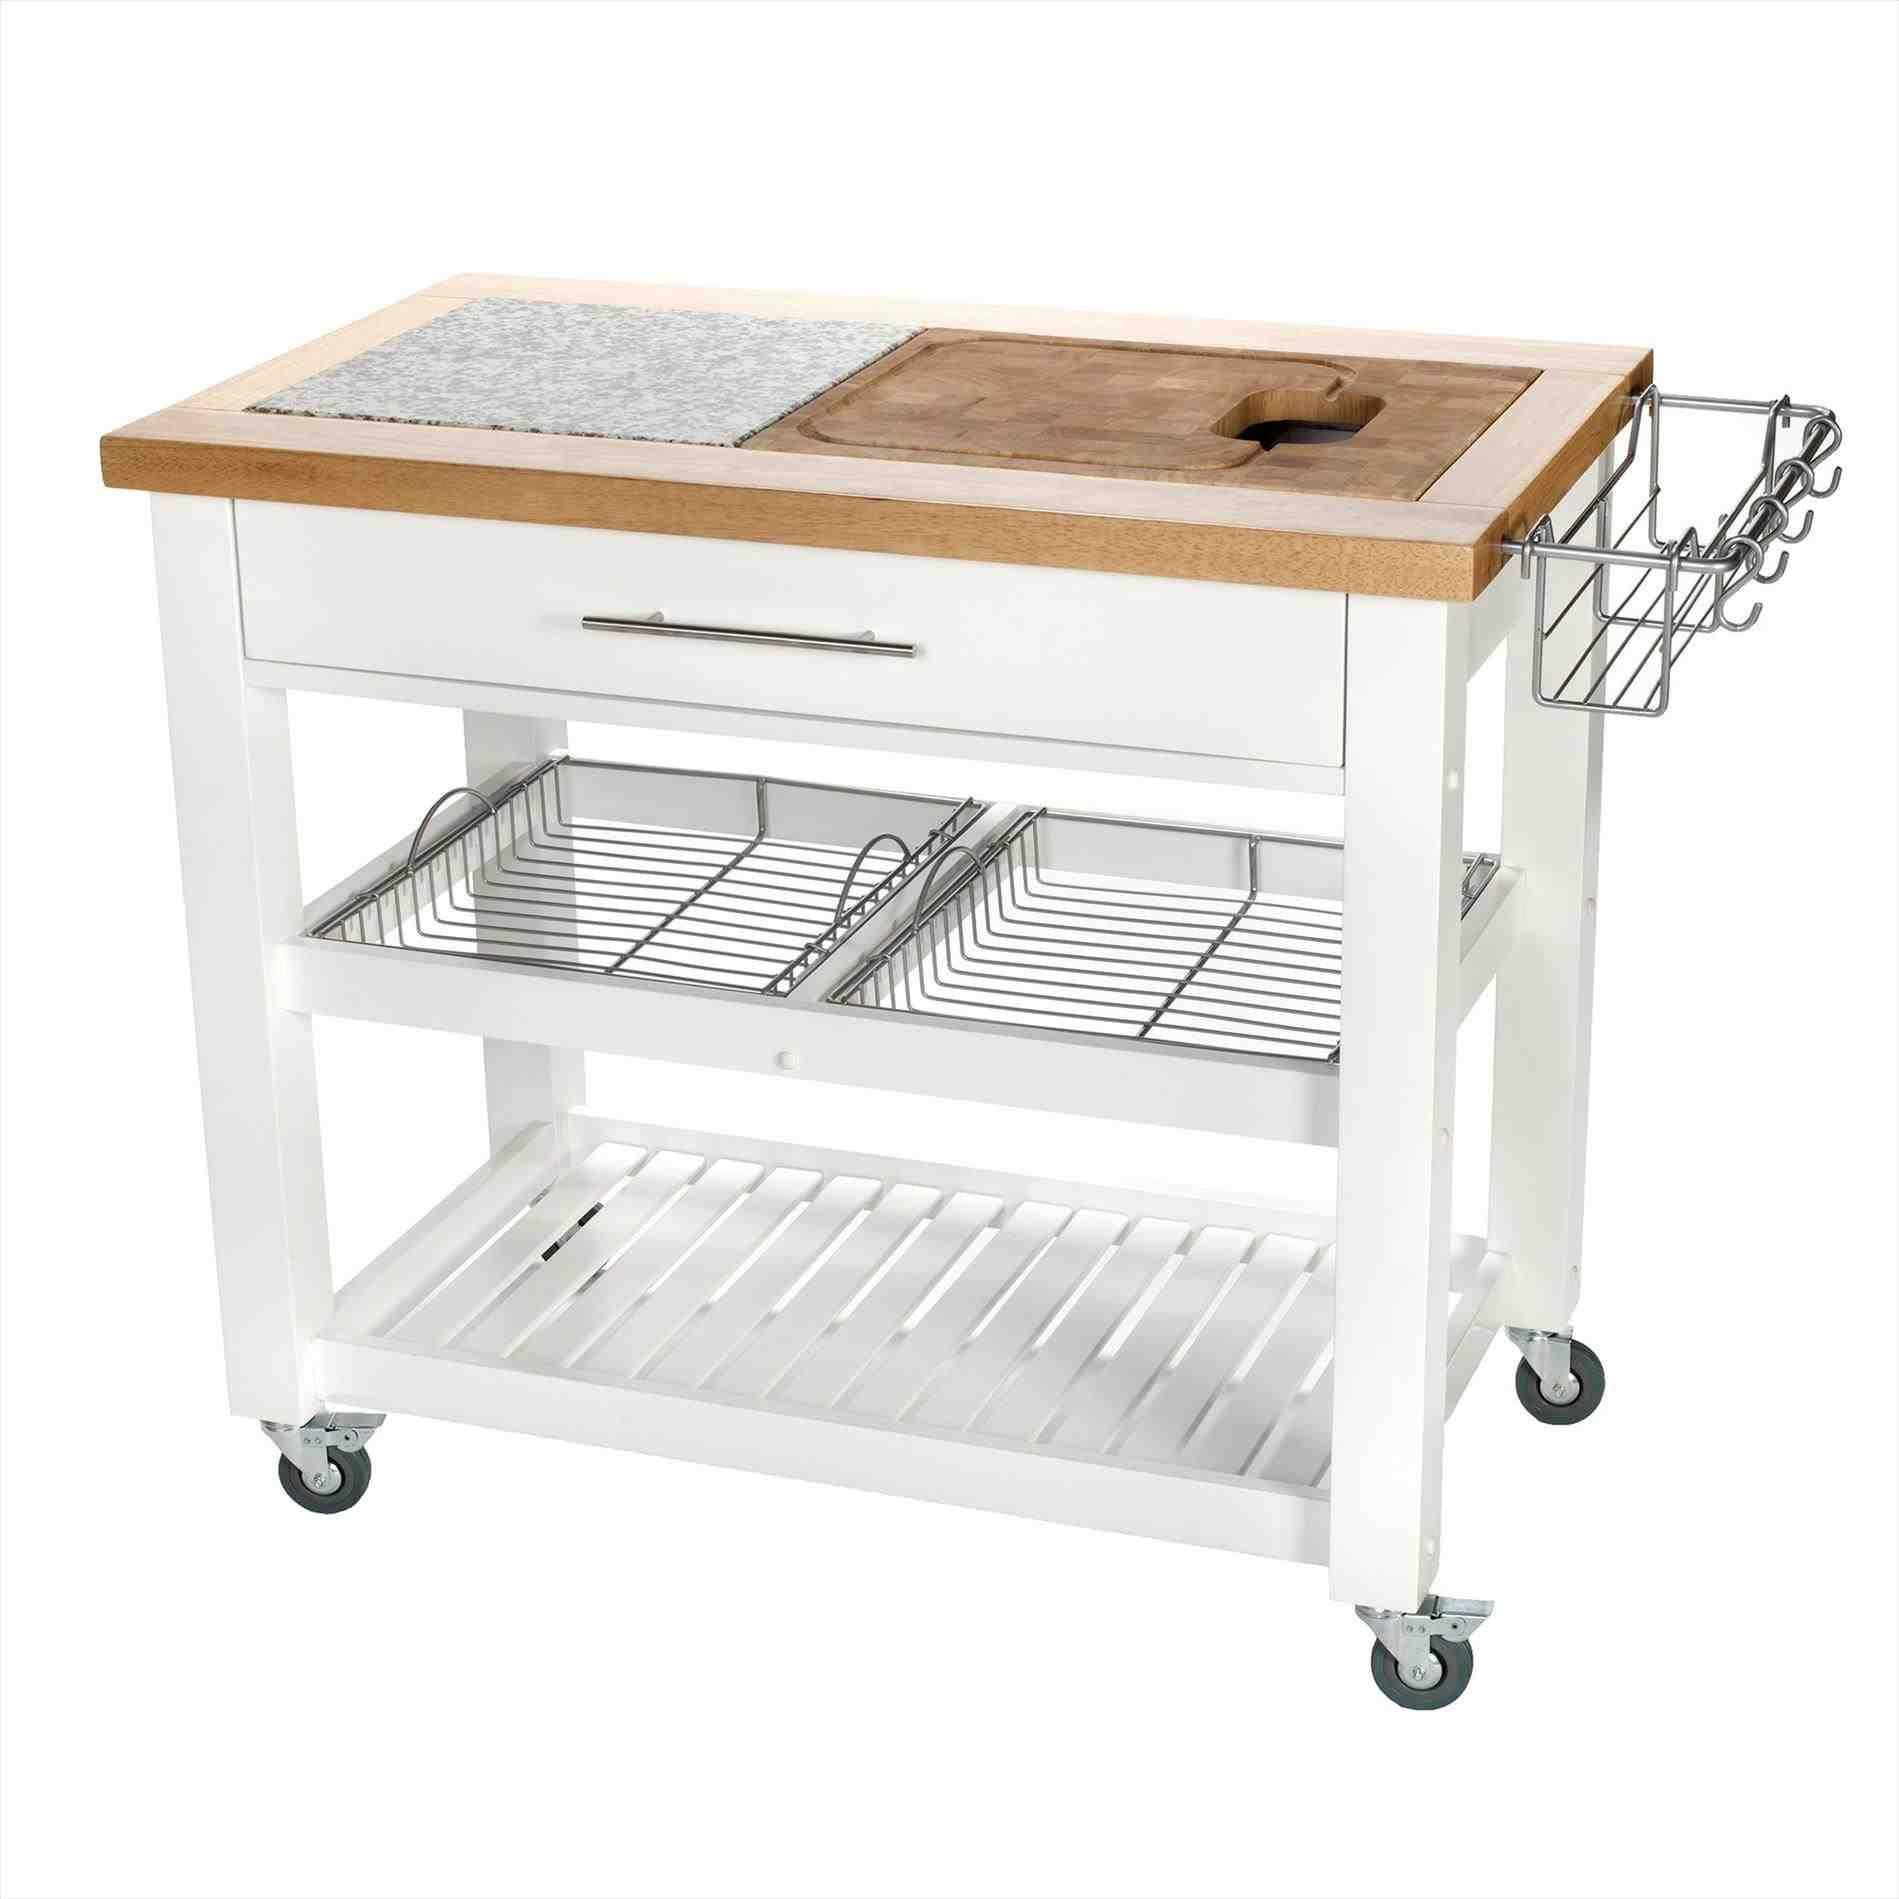 New Post mercial kitchen cart Decors Ideas